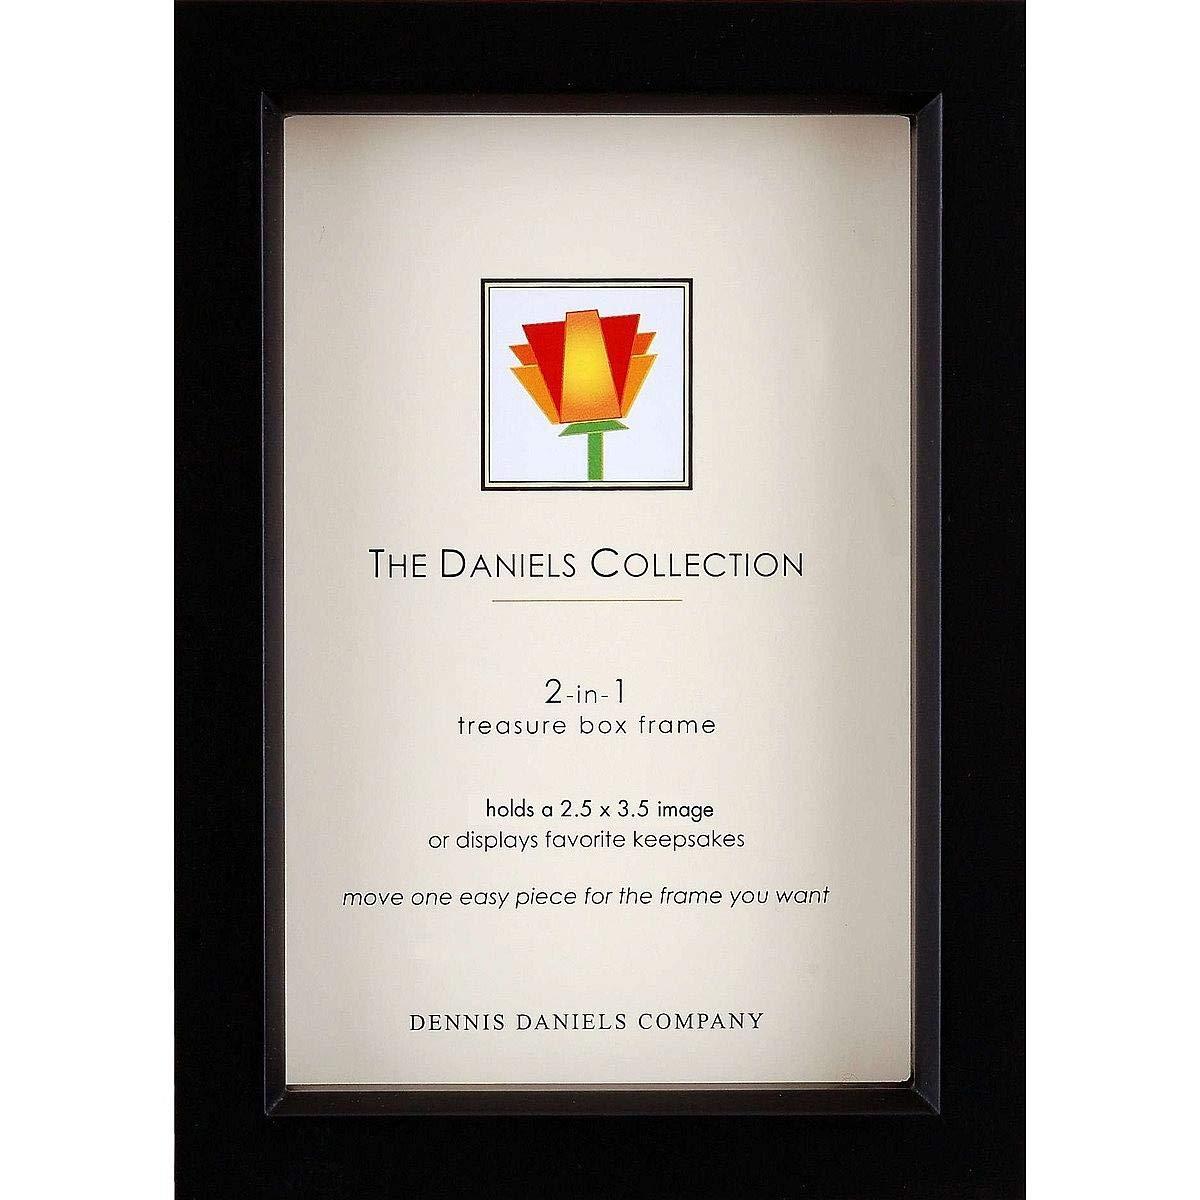 Dennis Daniels Wood Treasure Box Picture Frame, 2.5